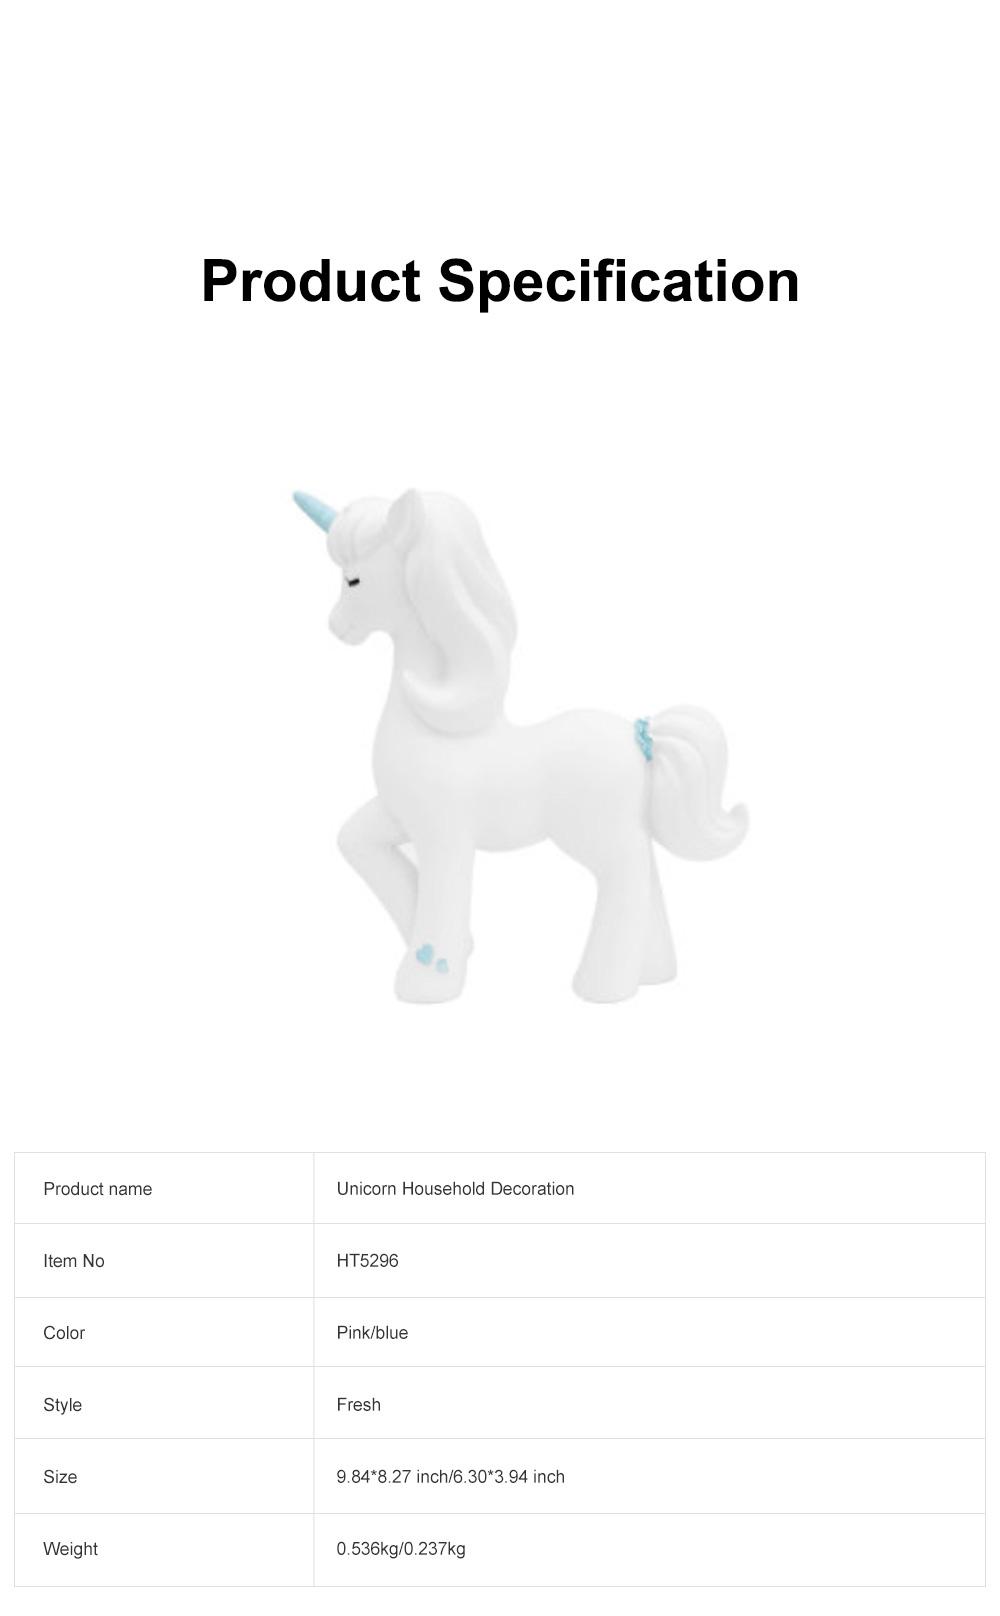 Crafts Unicorn Decoration Delicate Household Decorative Resin Unicorn for Living Room Bedroom Showcase 5